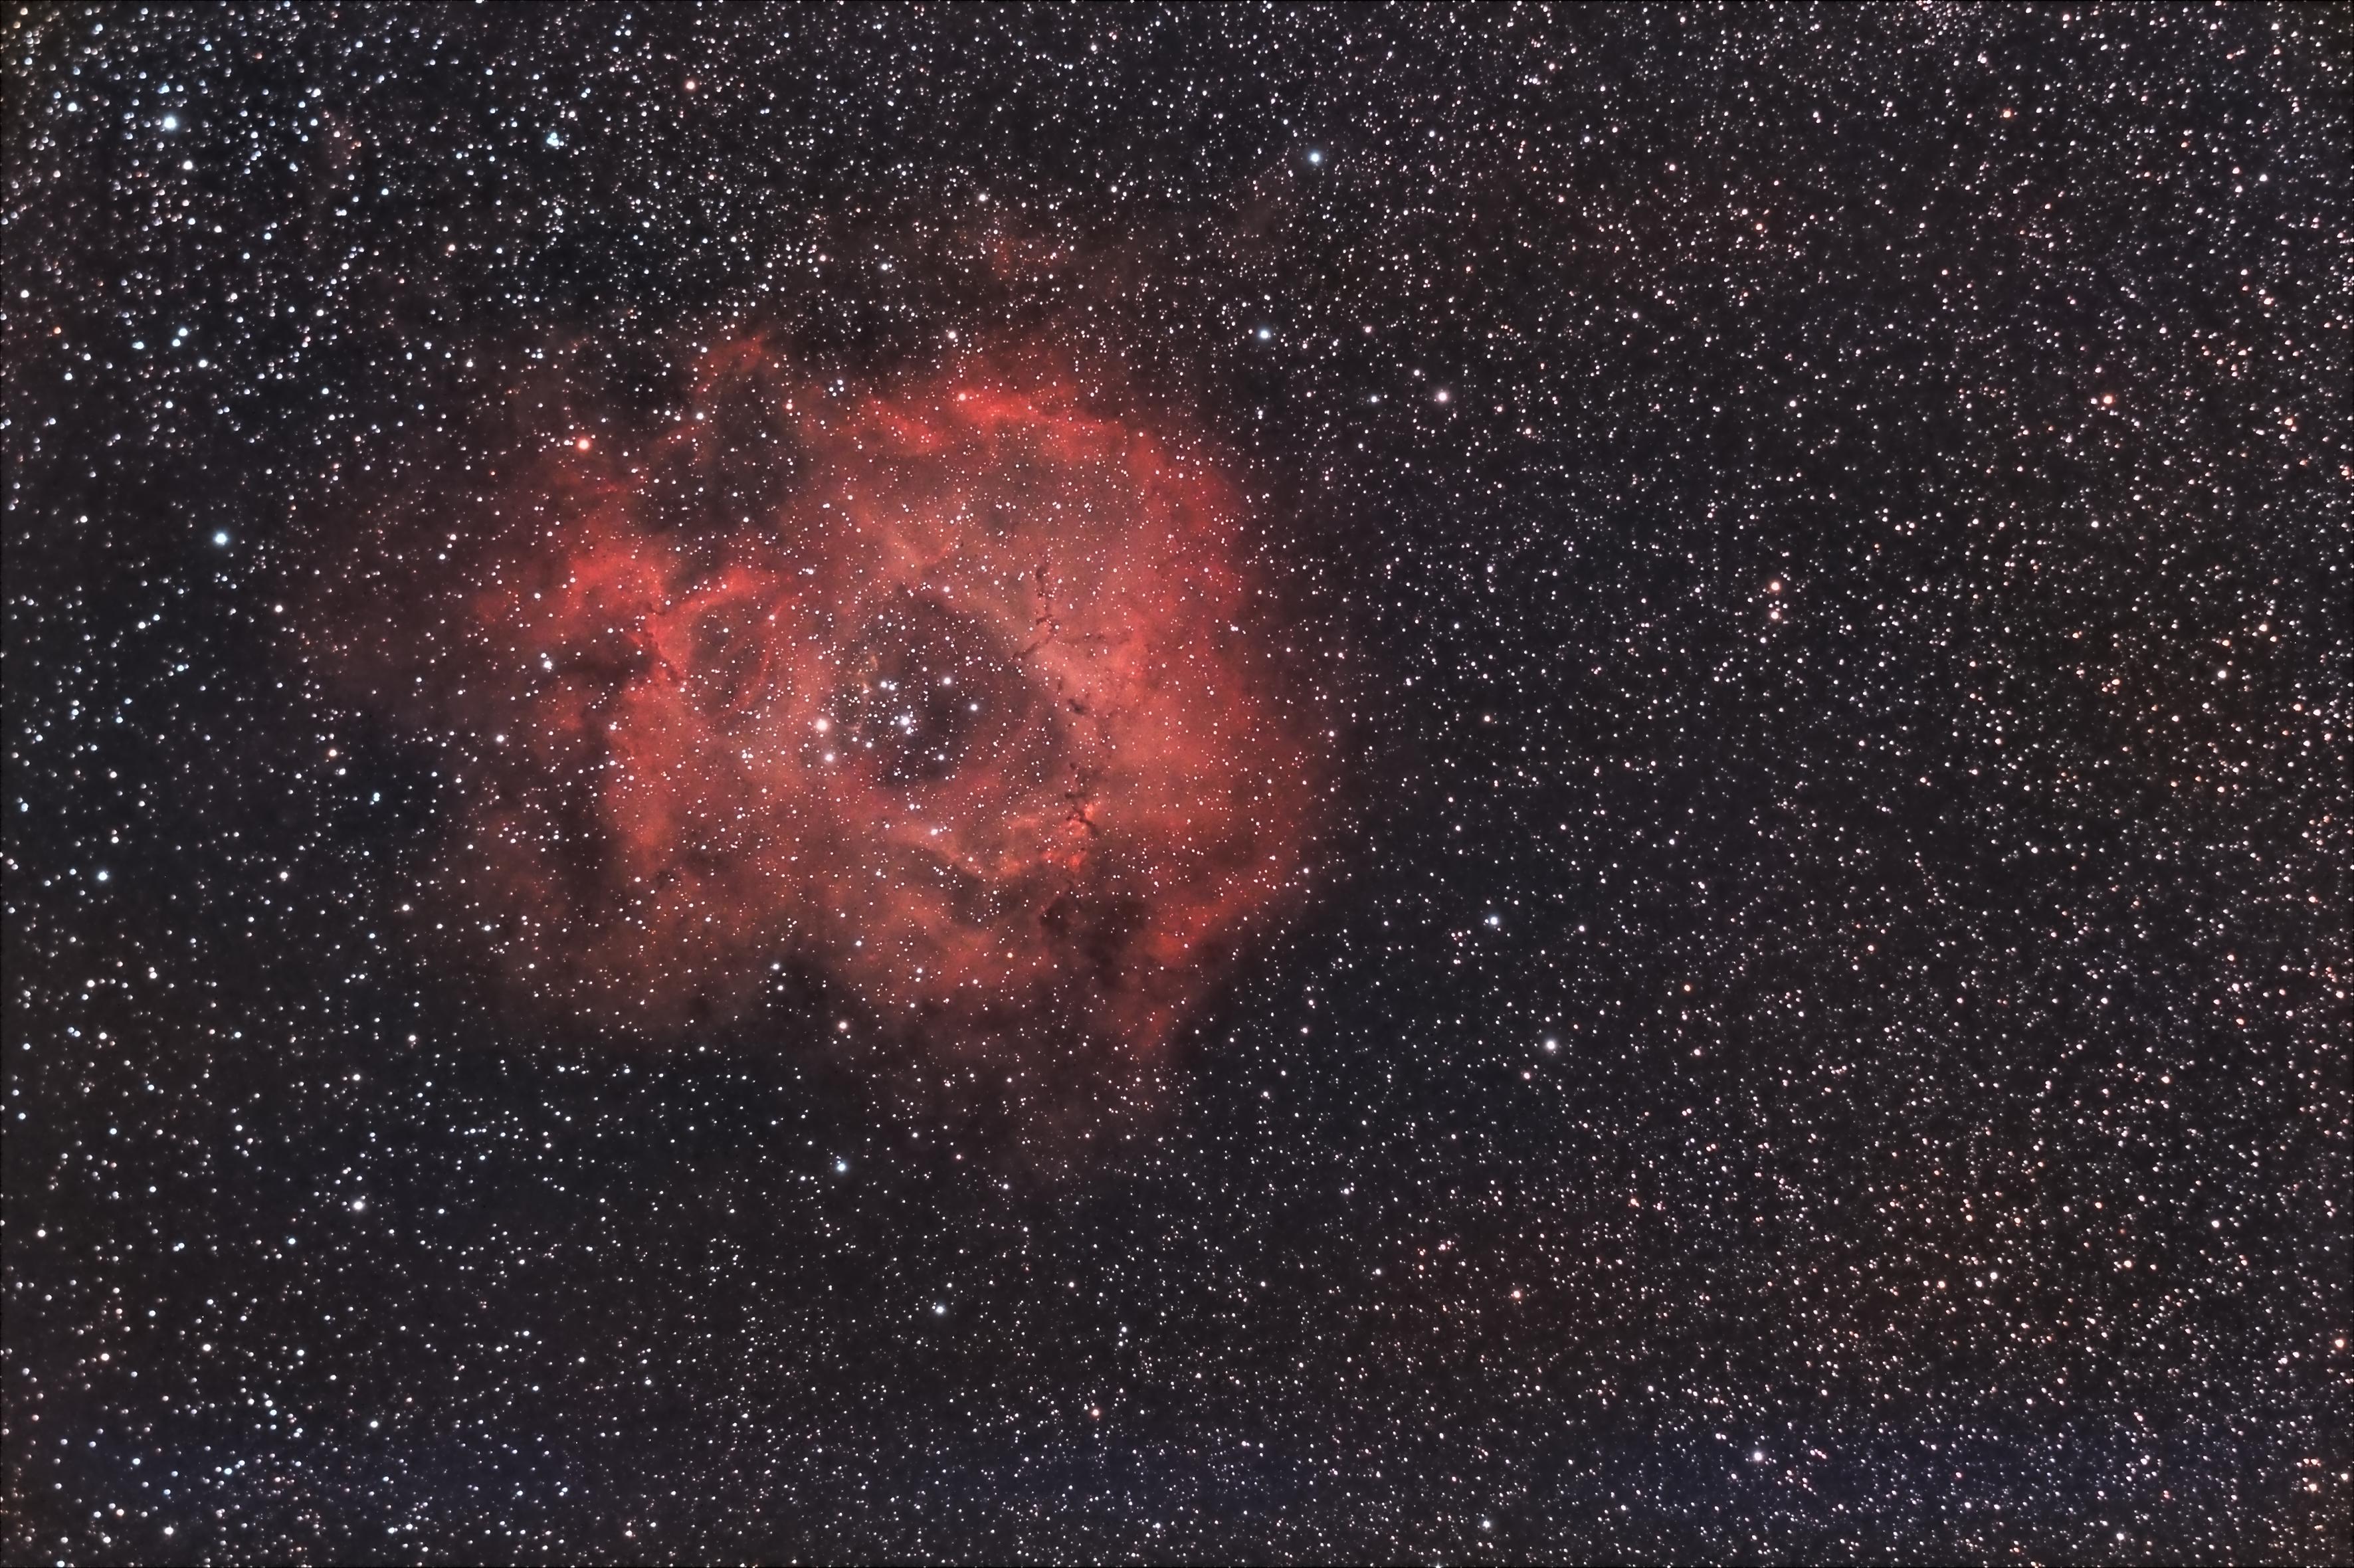 Rosetta250116-st8-CS5finalgroot